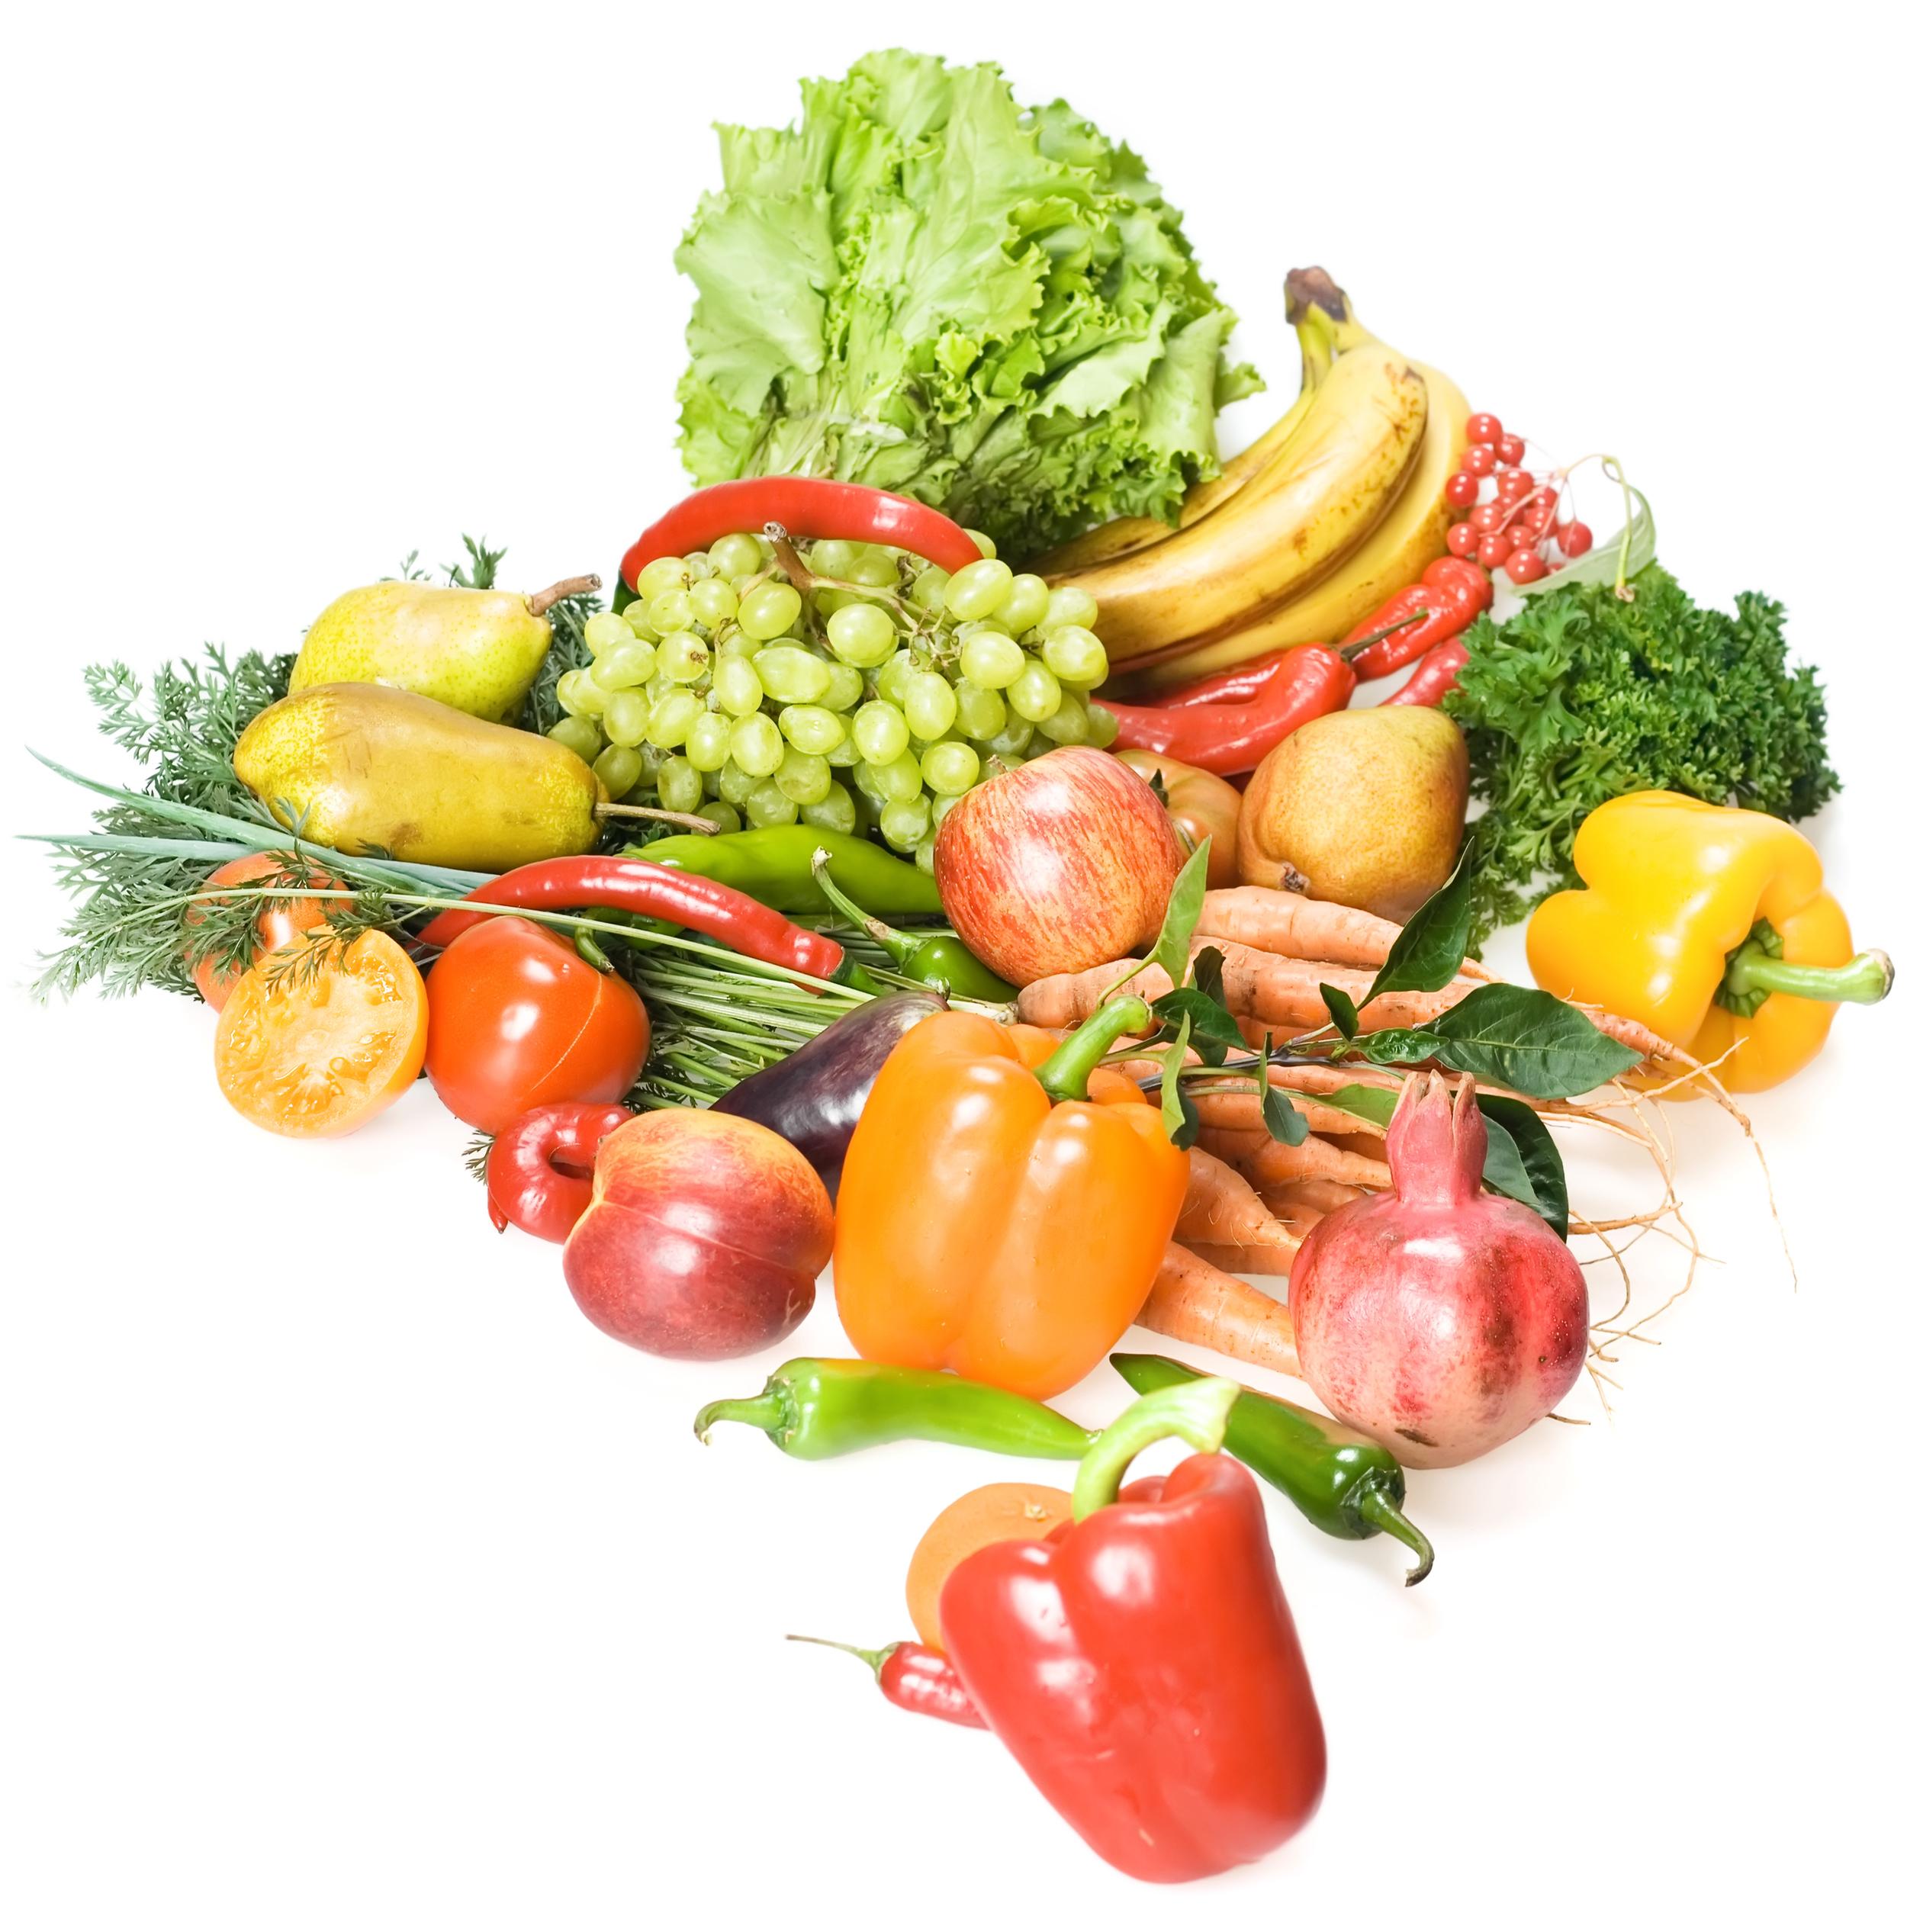 légumes-et-fruits-.jpg